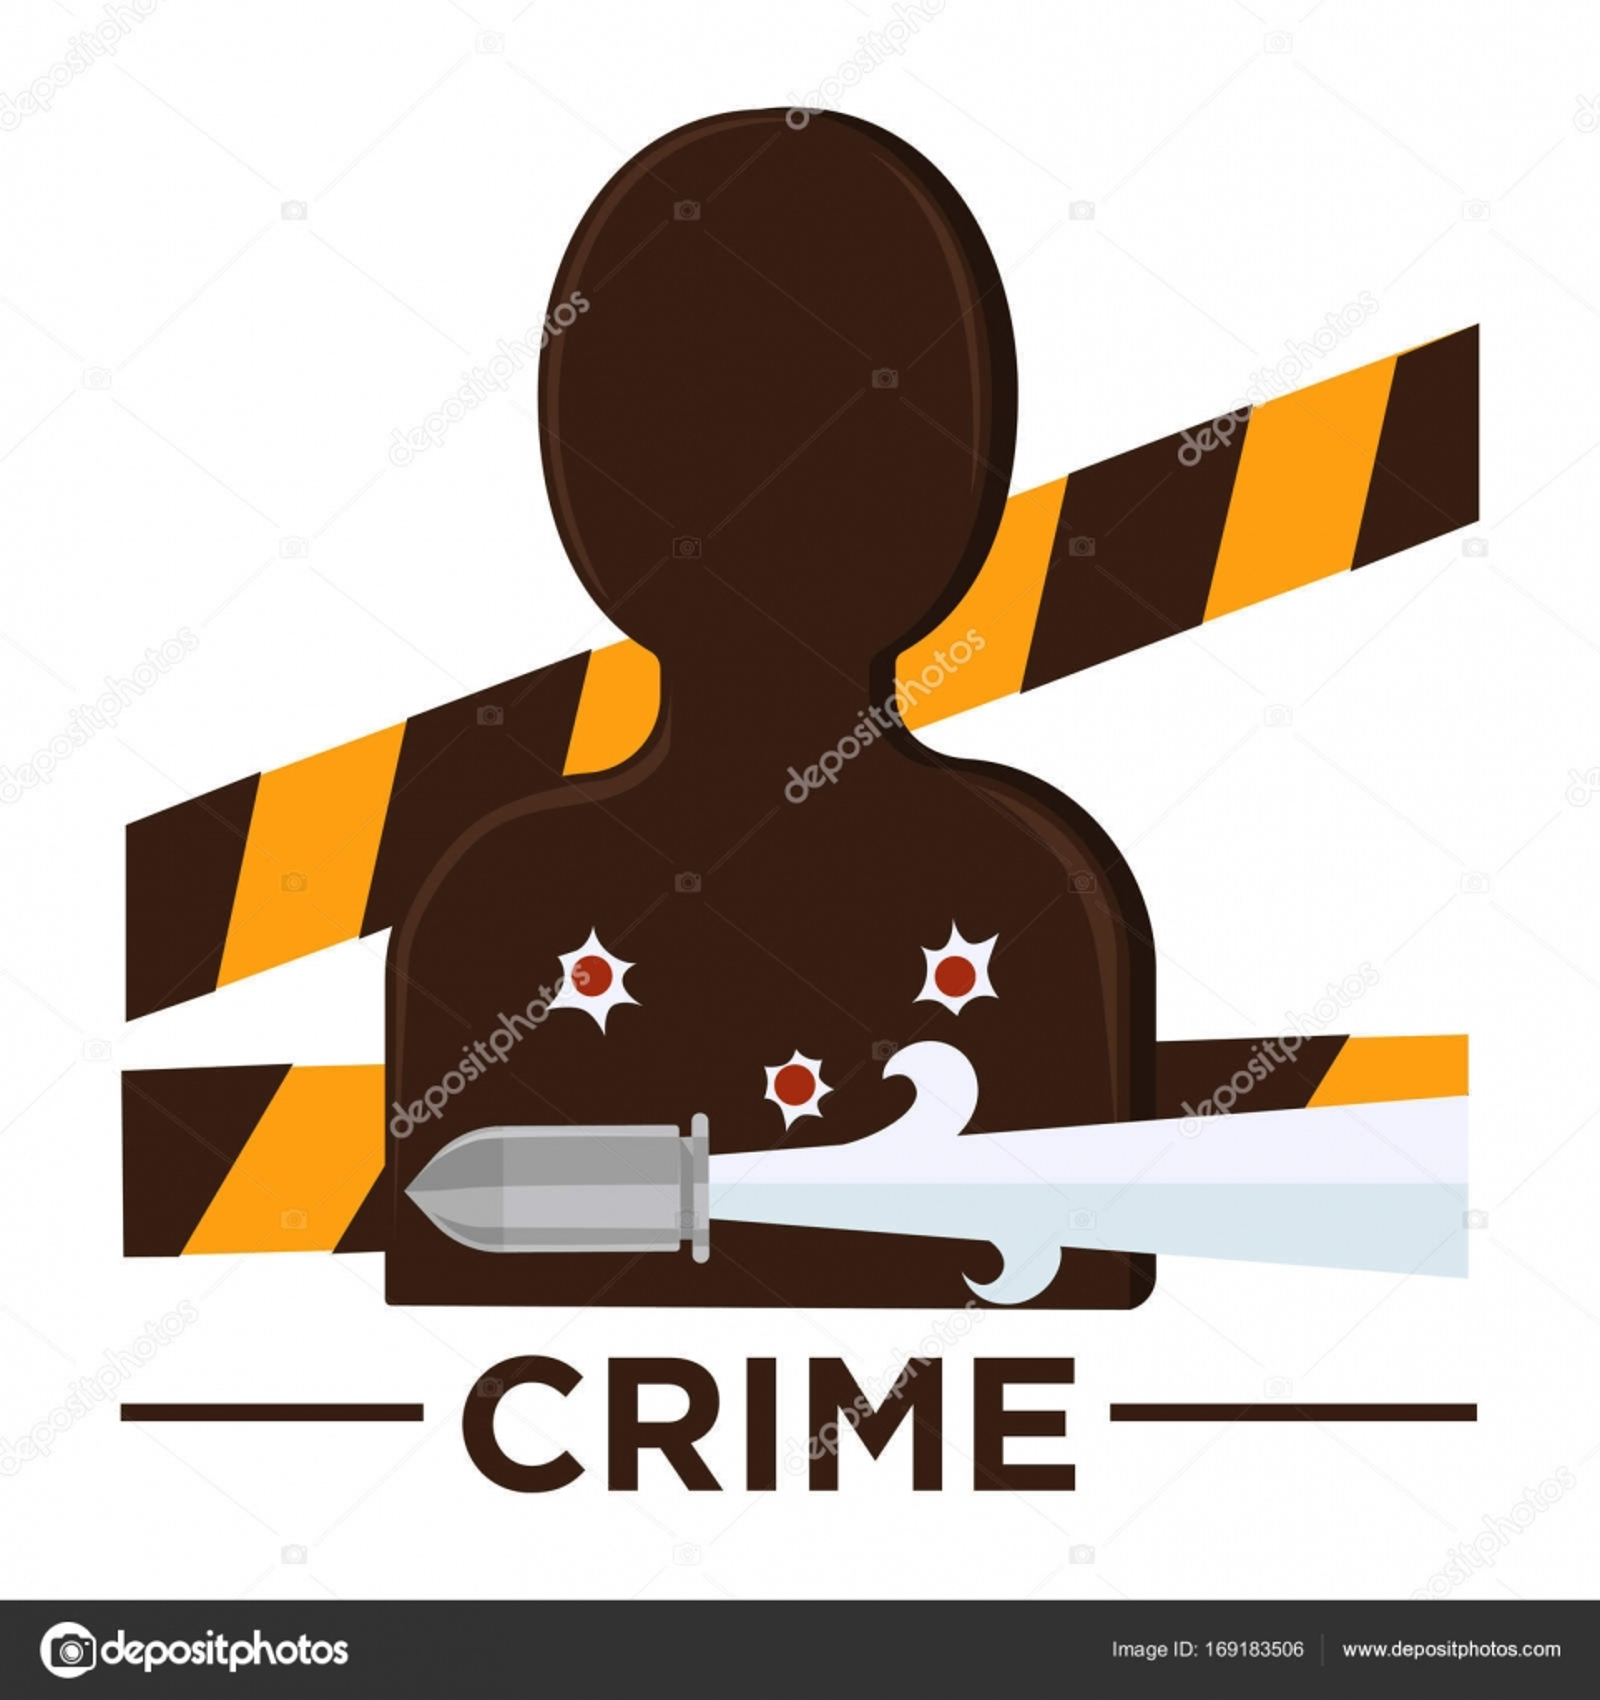 Movie crime genre icon stock vector sonulkaster 169183506 movie crime genre icon with bullet and bullet wounds symbols for cinema or channel movie genre tag vector by sonulkaster biocorpaavc